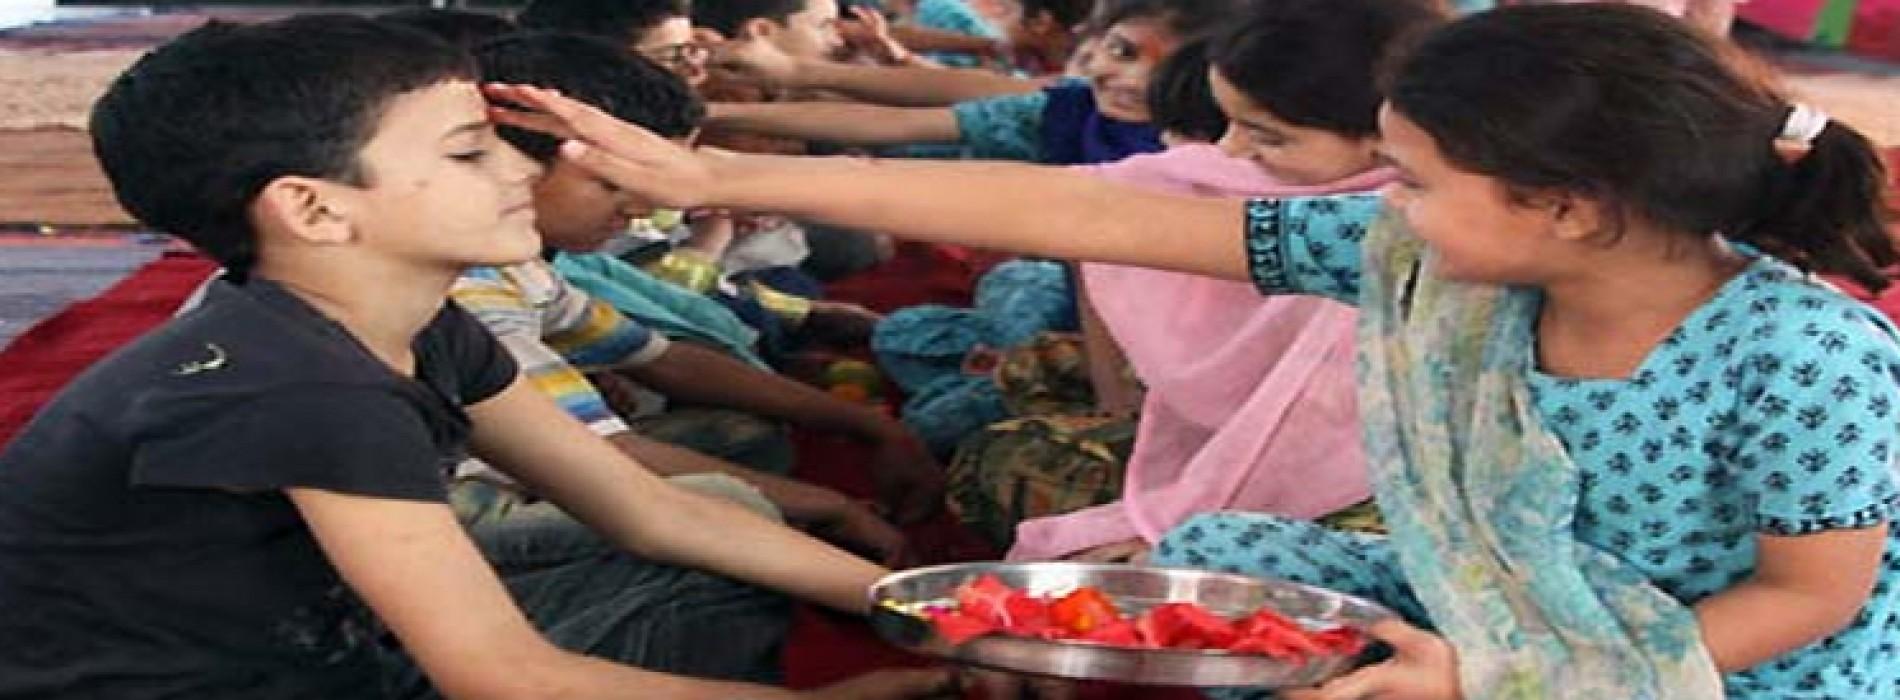 Bhai Dooj Celebrations in India and Nepal